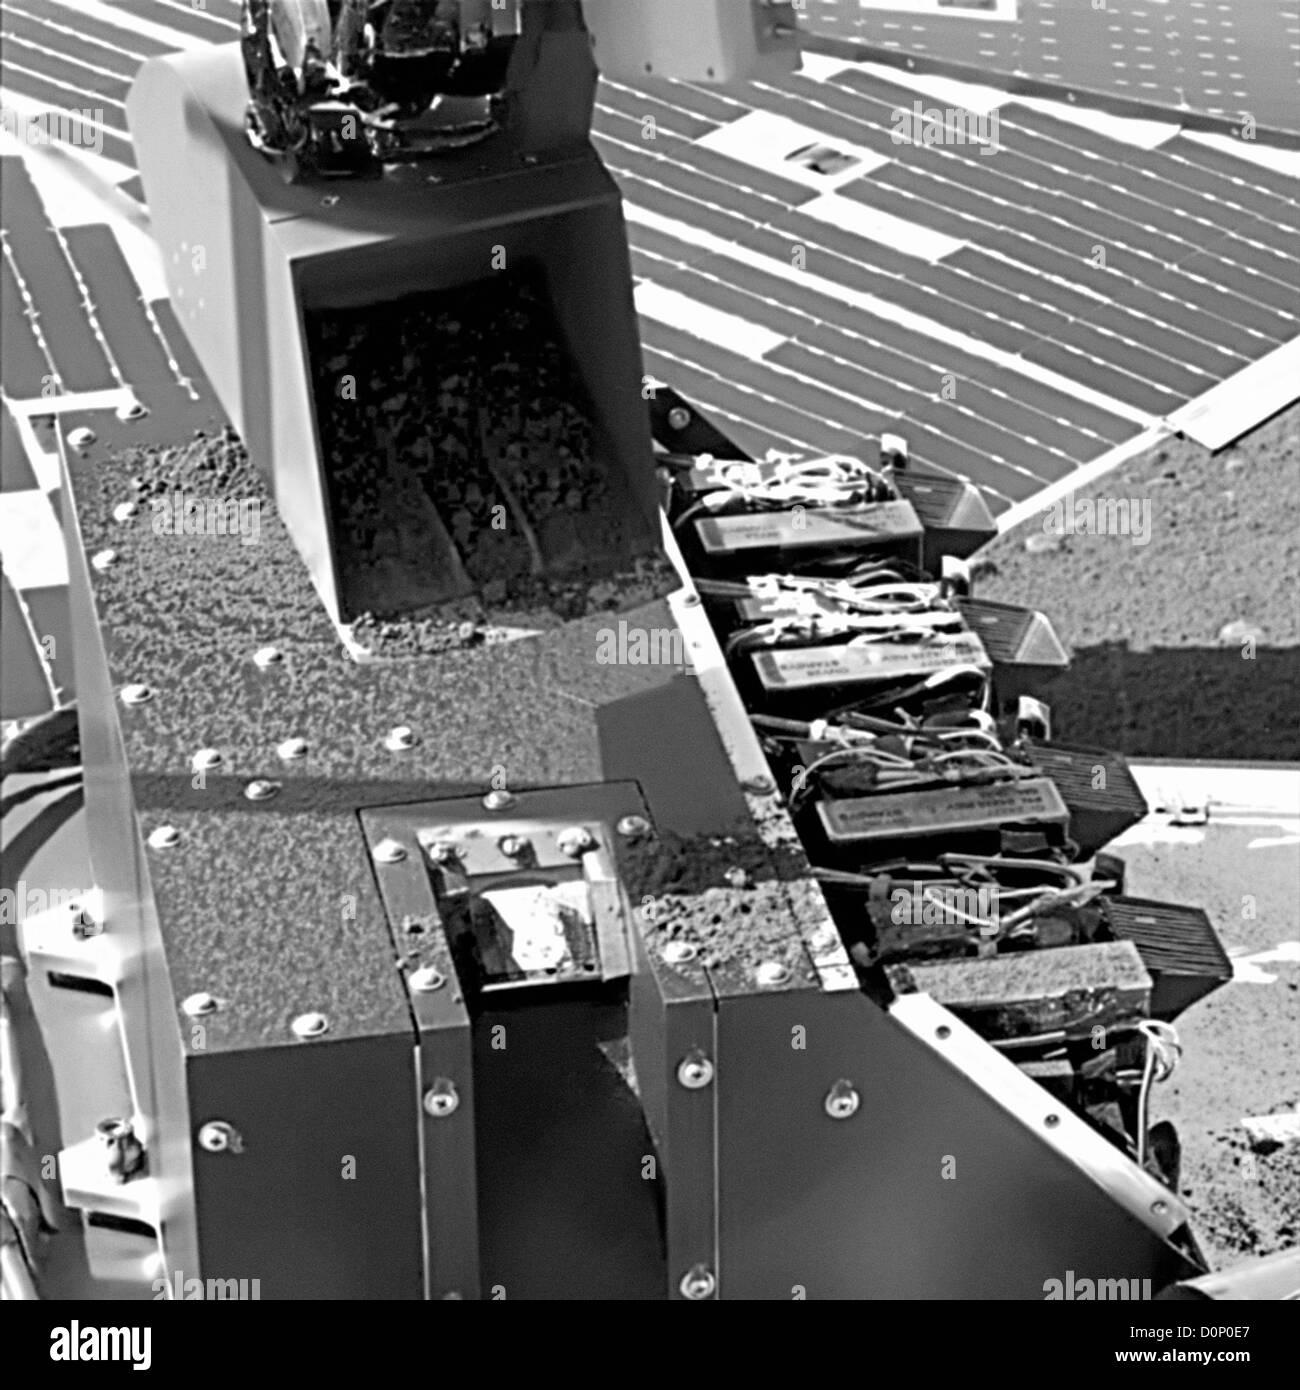 Phoenix's Robotic Arm Delivers Soil Samples - Stock Image